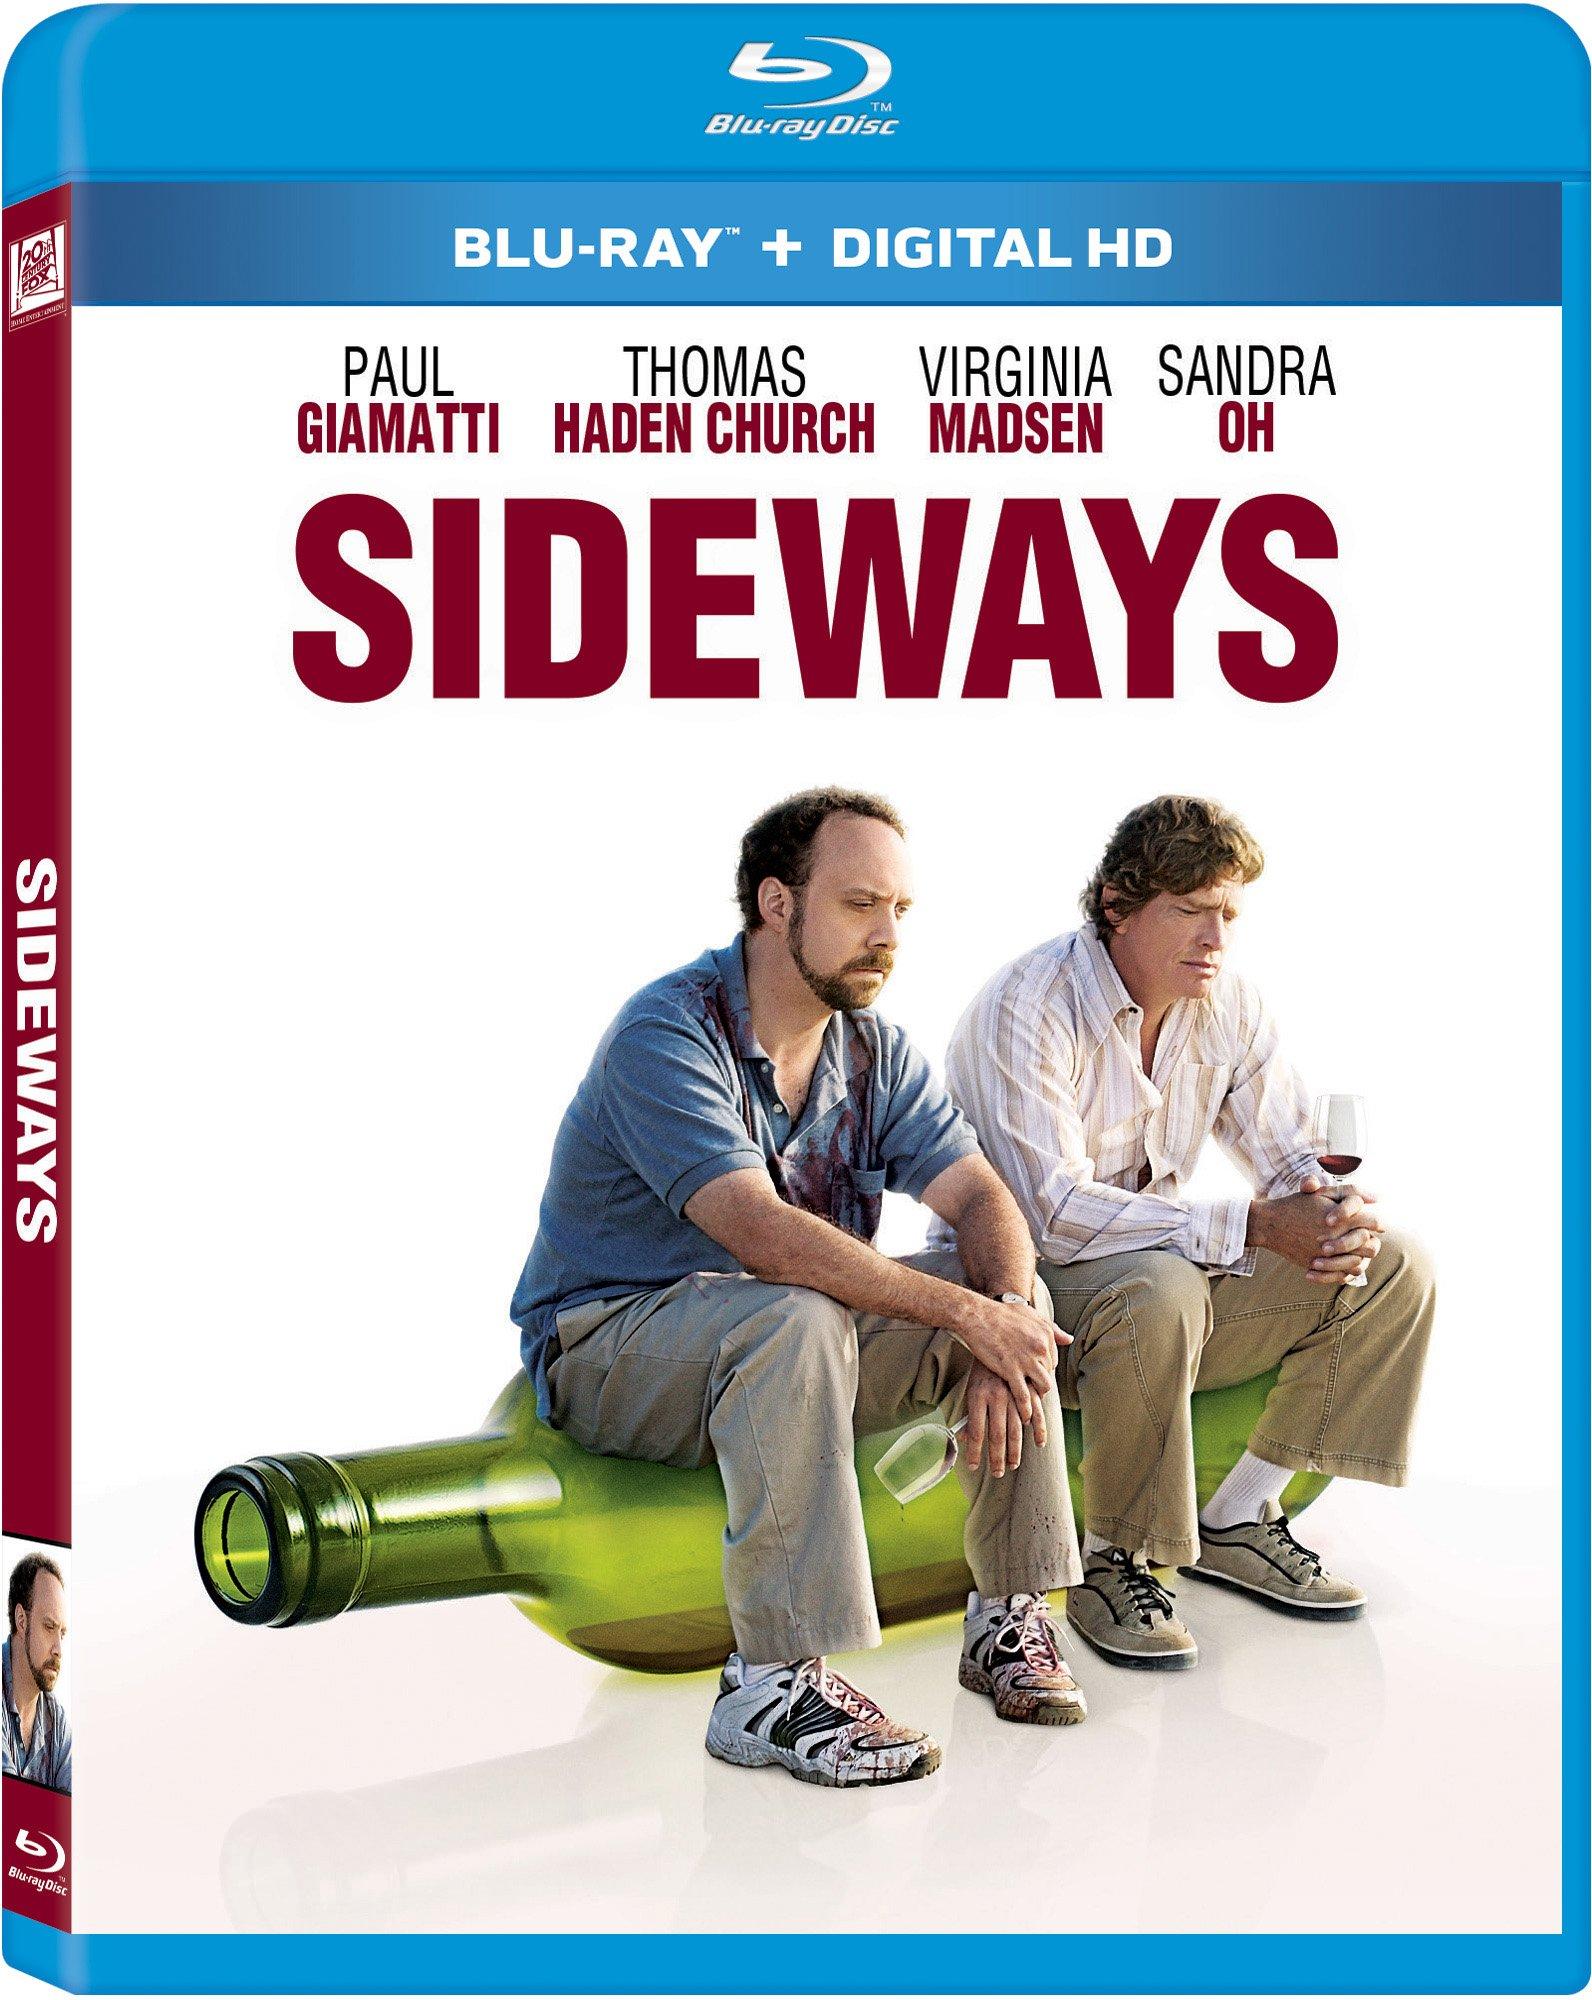 Blu-ray : Sideways 10th Anniversary Edition (Anniversary Edition, , Widescreen, AC-3, Digital Theater System)